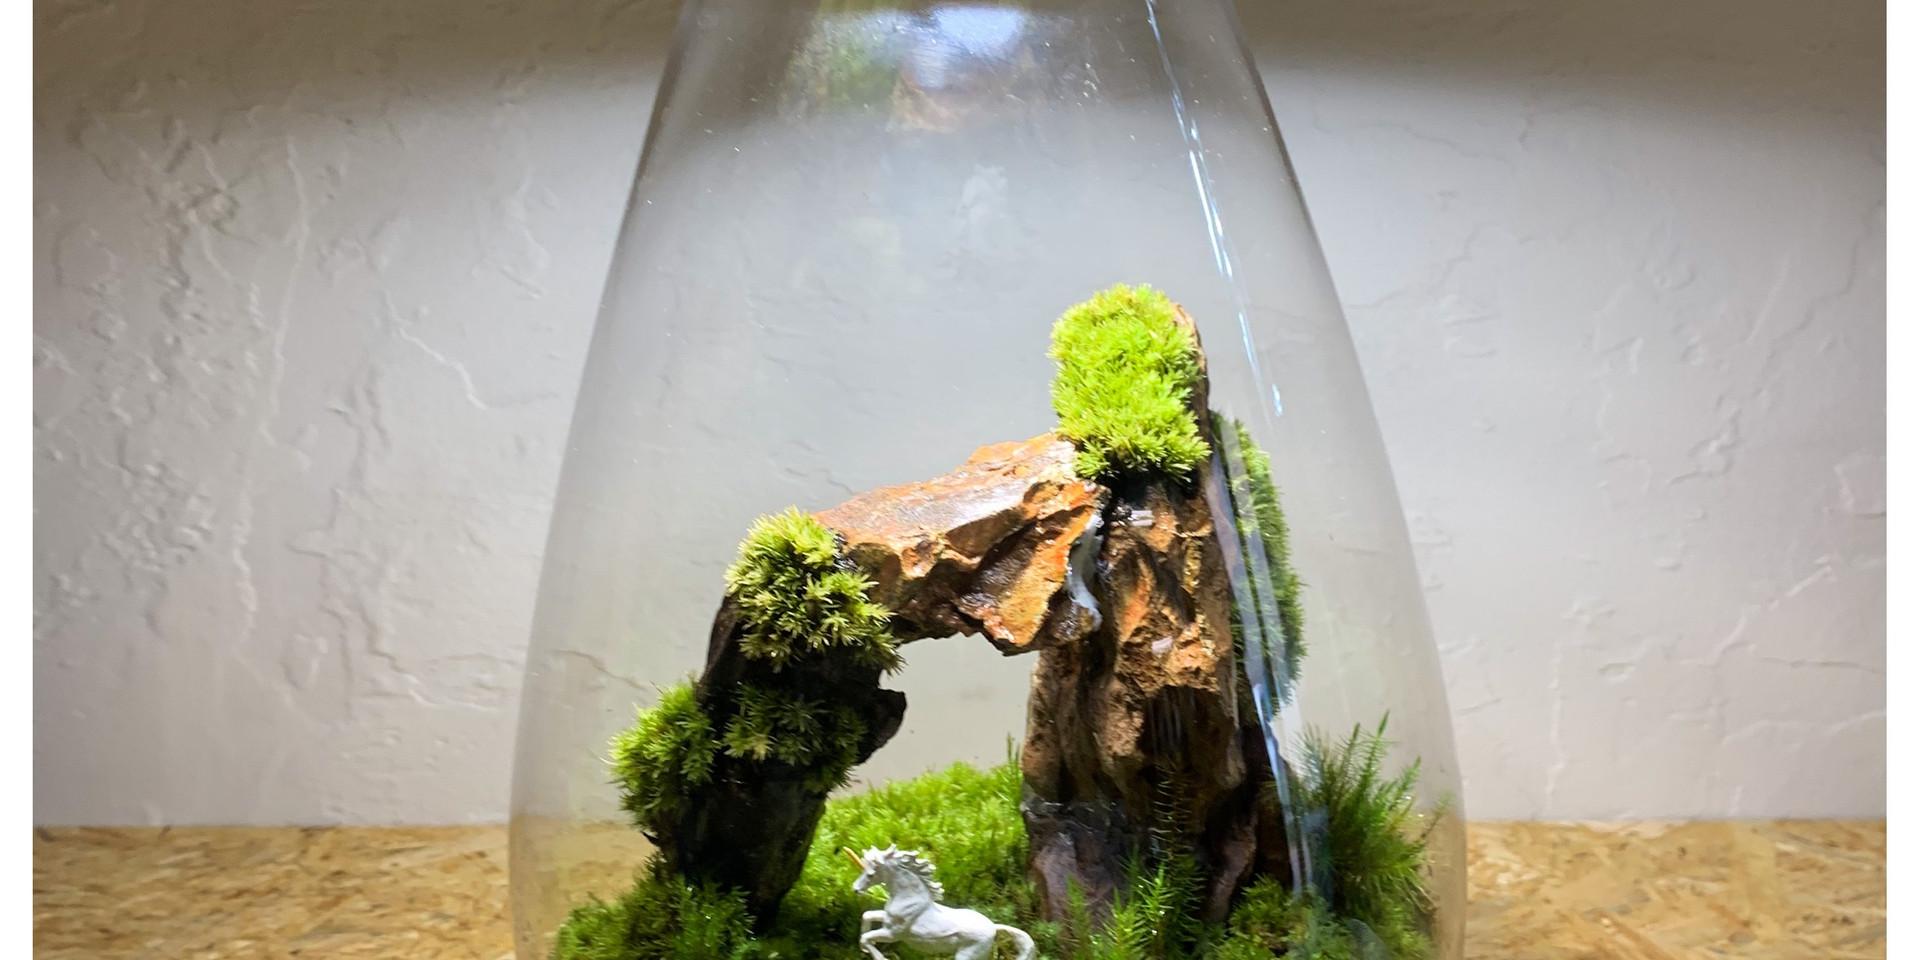 Mosslight×Feel The Gardenコラボ.jpg